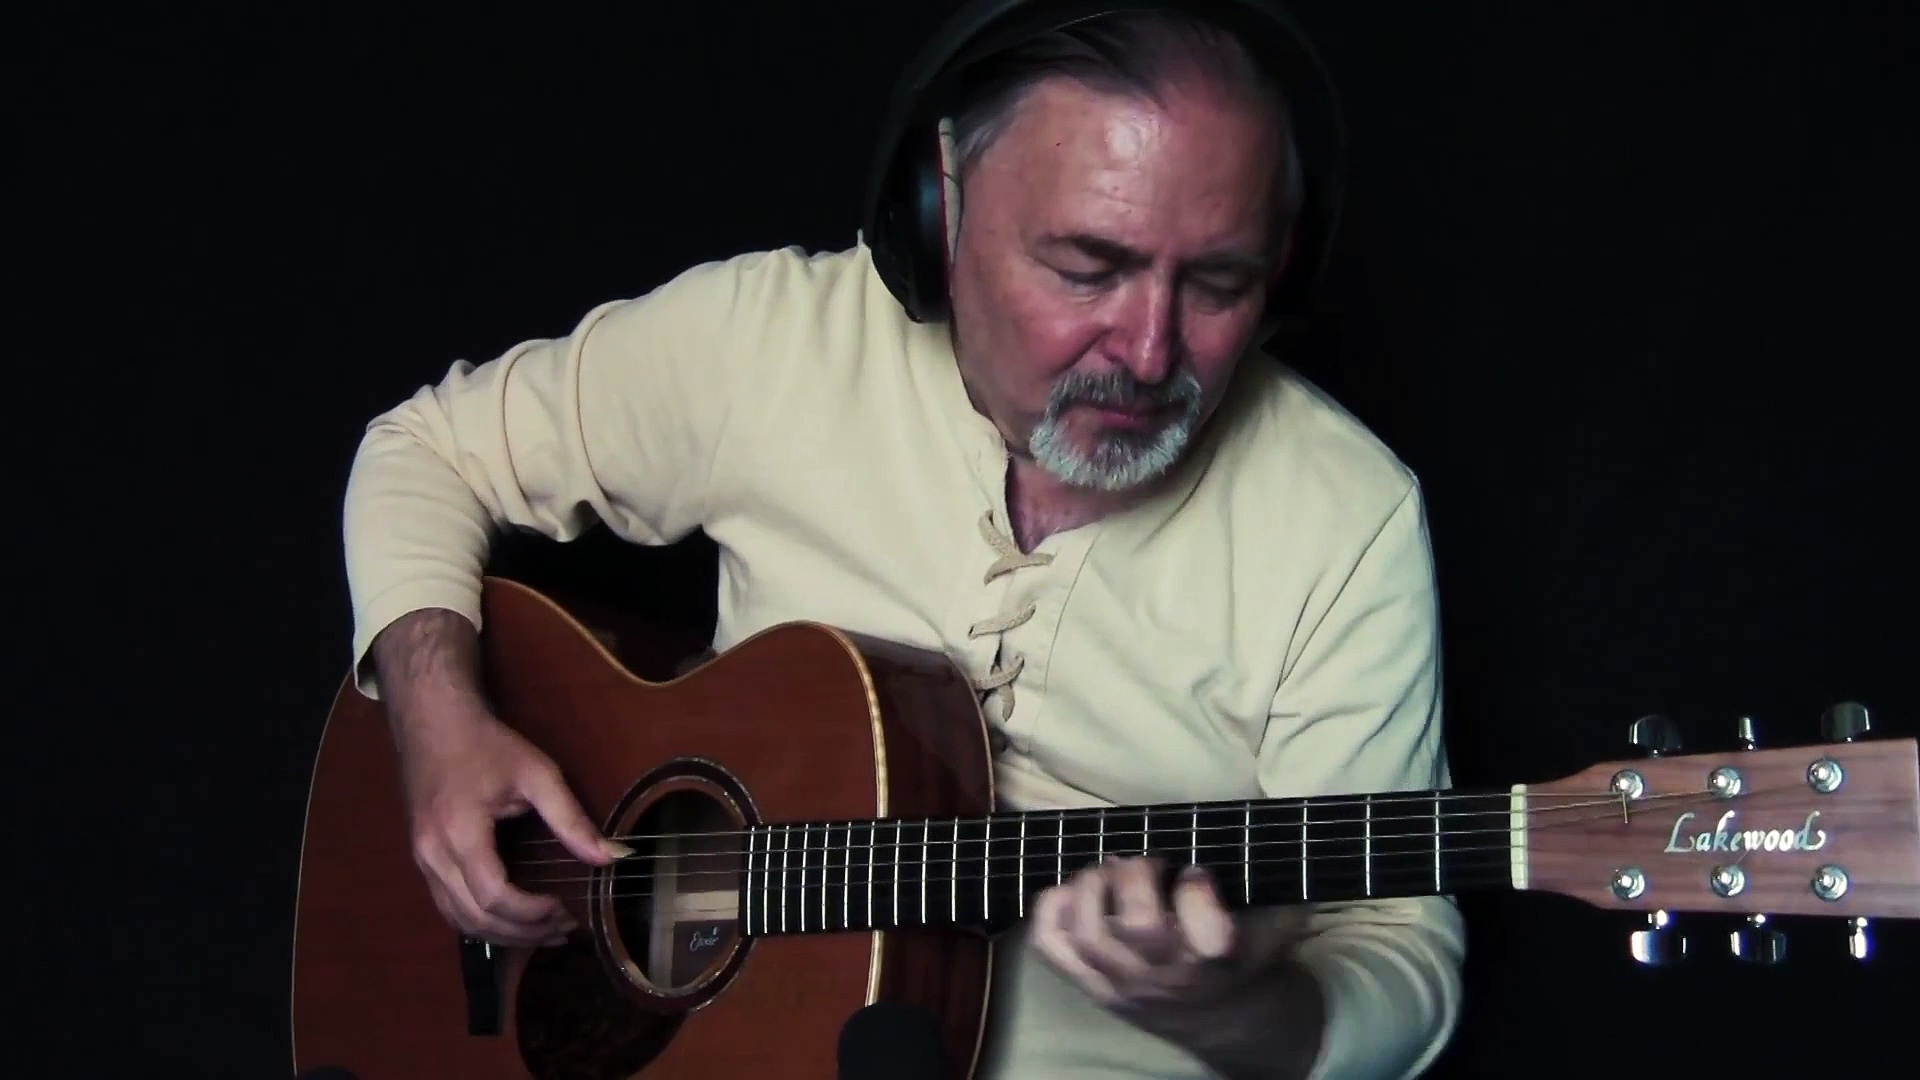 Musique de Game Of Thrones jouée à la guitare – Igor Presnyakov – acoustic fingerstyle guitar